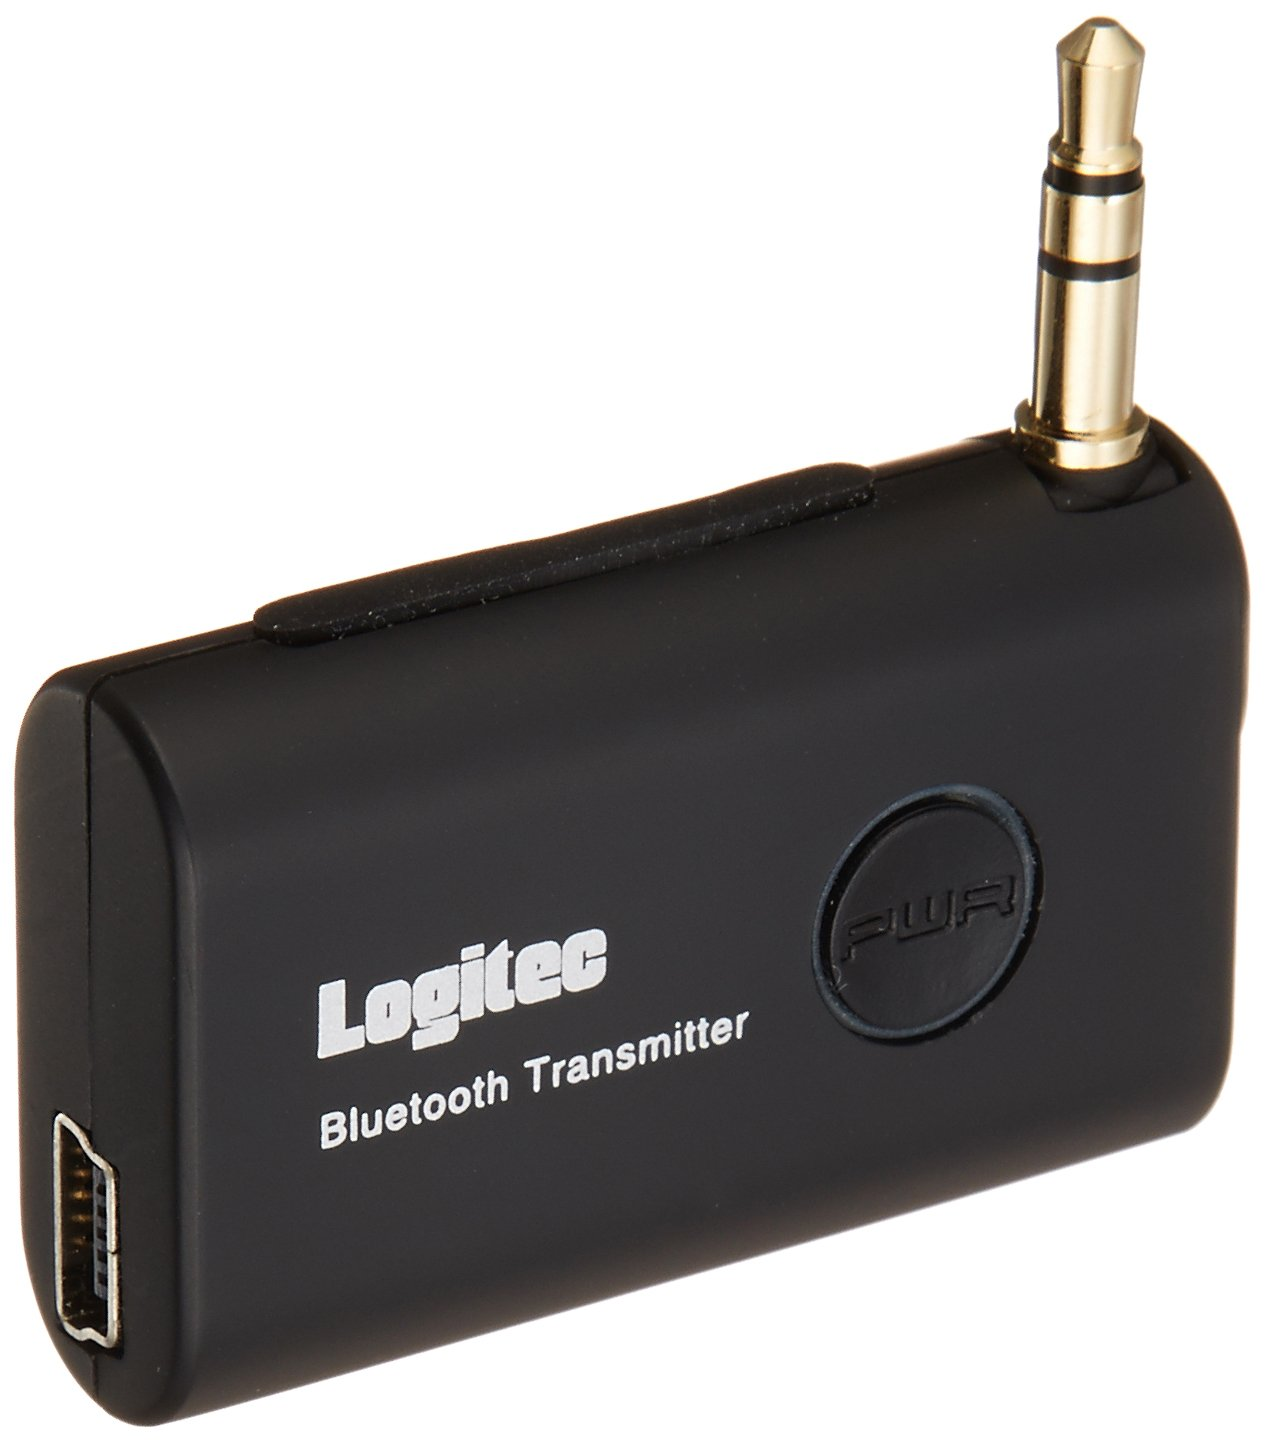 Logitec Bluetooth2.1 Audio Transmitter USB black LBT-AT100C2 F/S